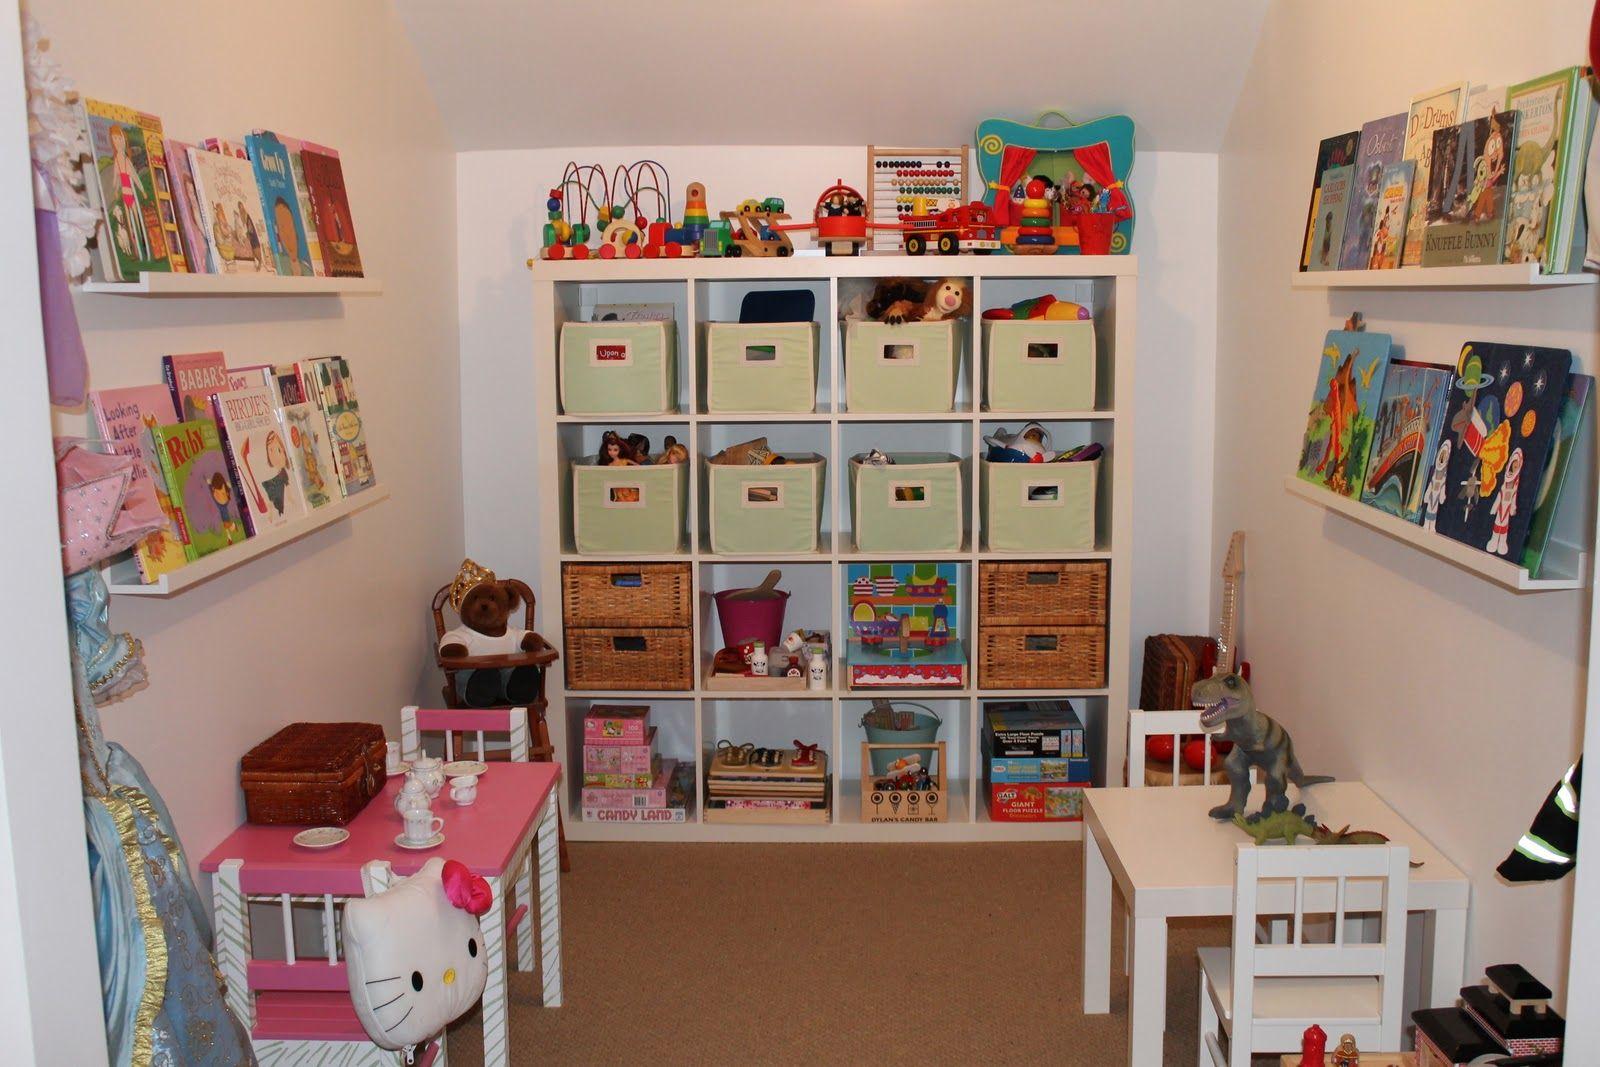 matt furniture playroom childrens home jentry choice design cupboard children and s sets option best